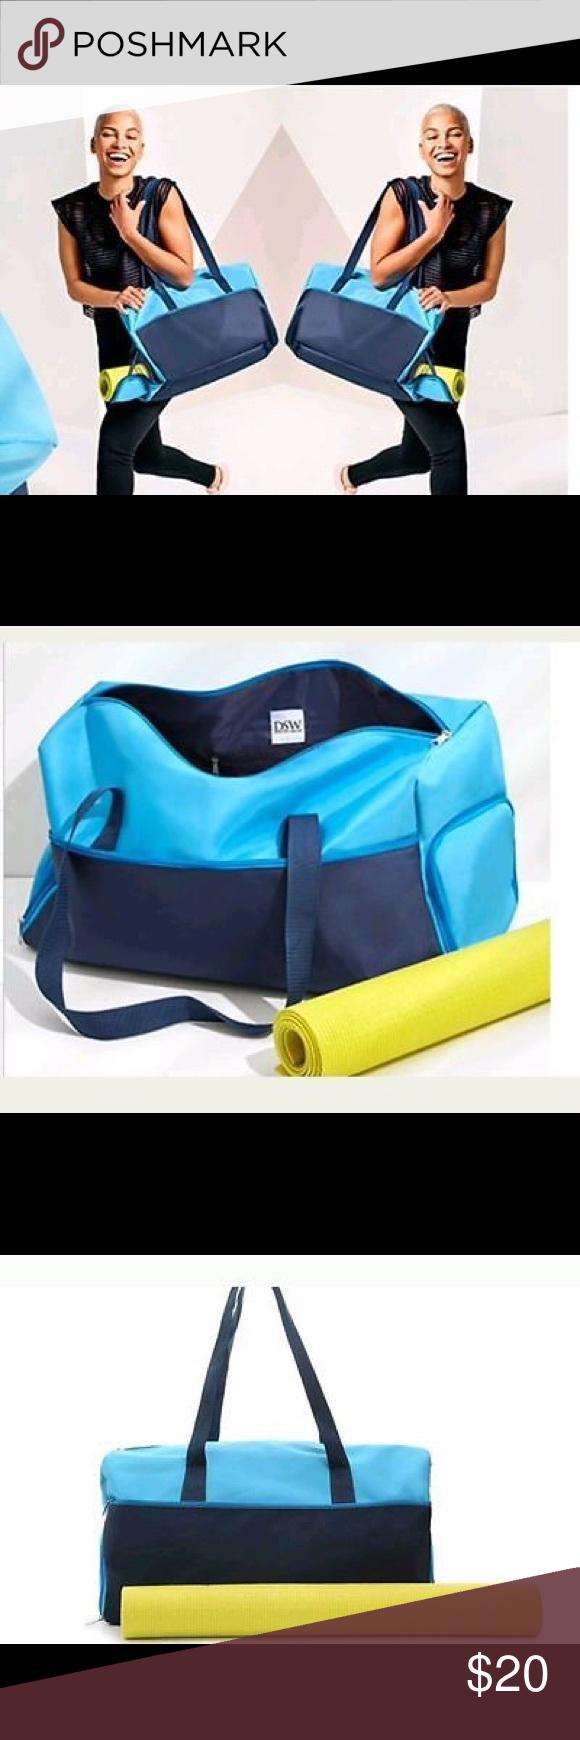 Nwt Yoga Gym Bag From Dsw Bags Gym Bag Yoga Gym Bag